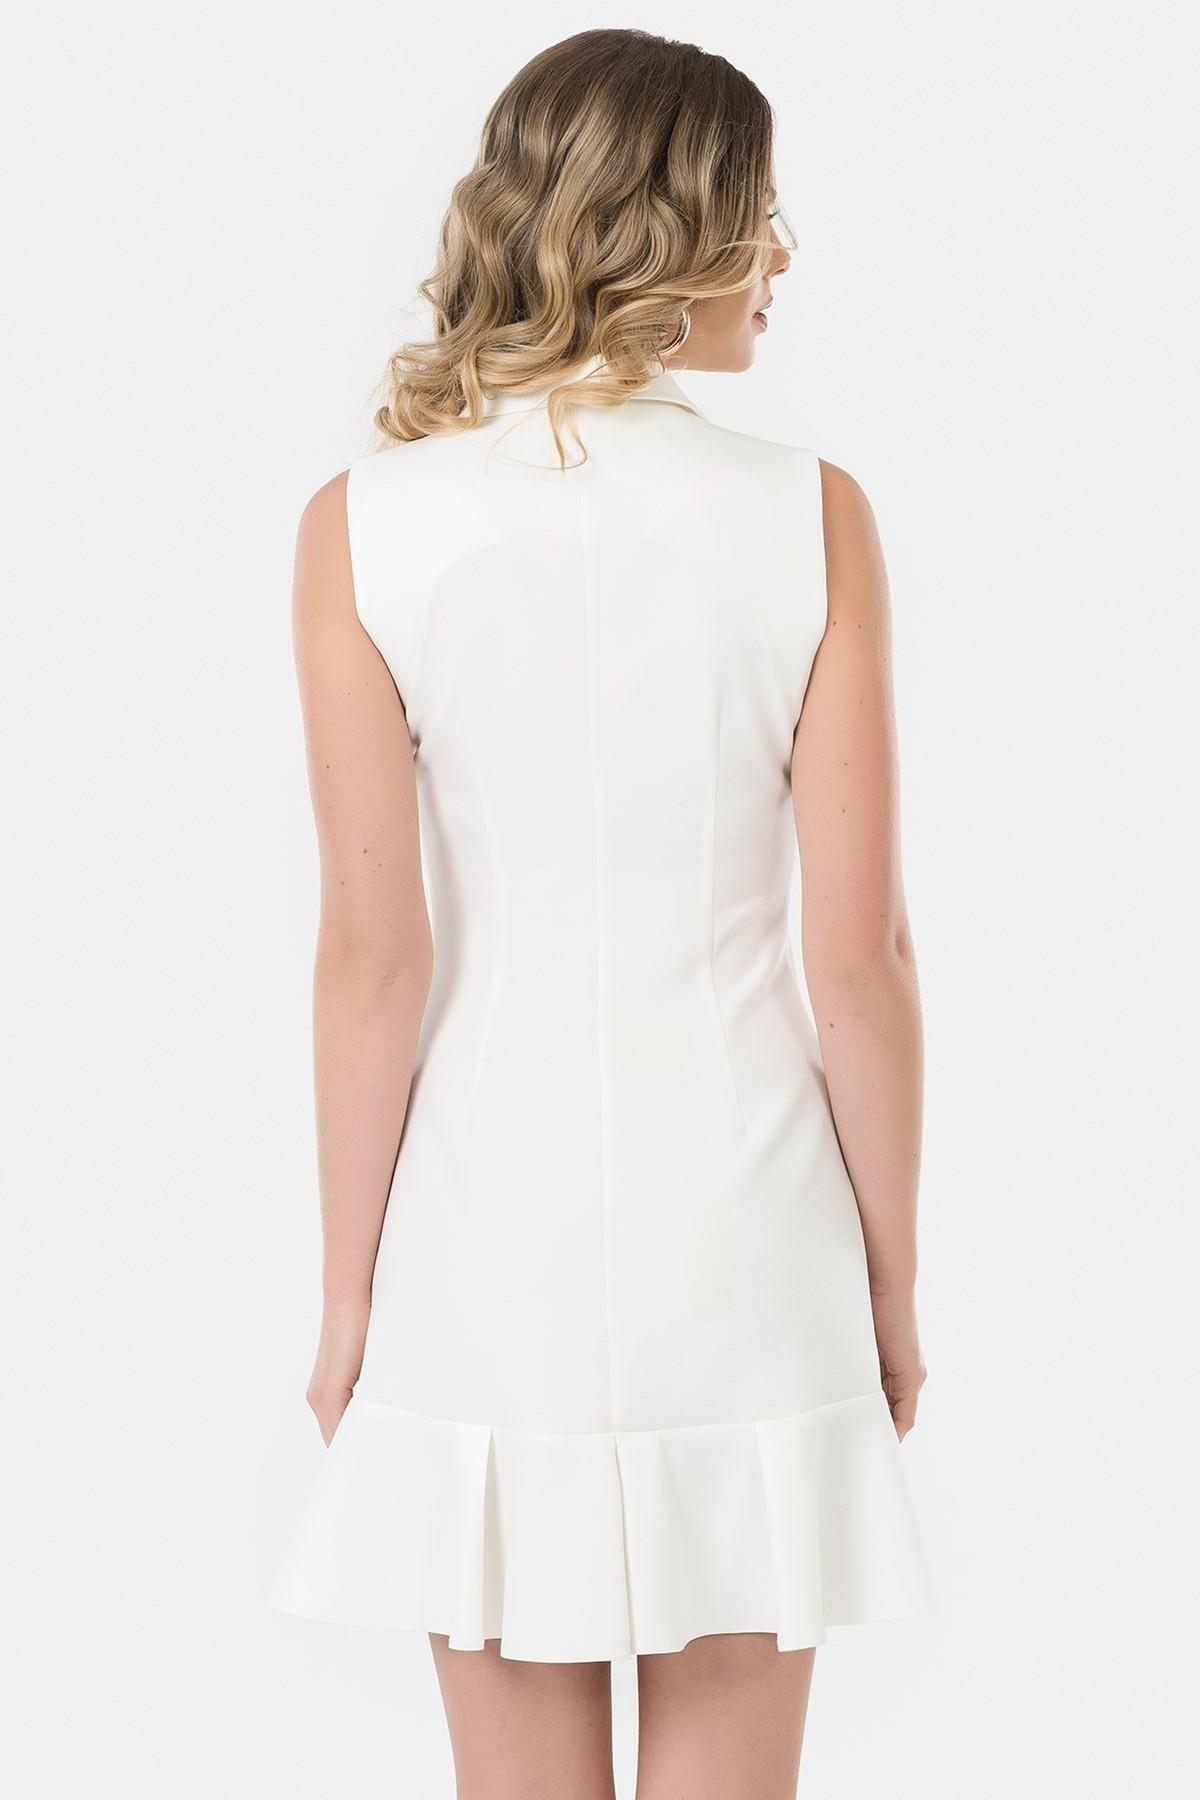 İroni Kadın Ekru Kolsuz Blazer Elbise 5132-891 2